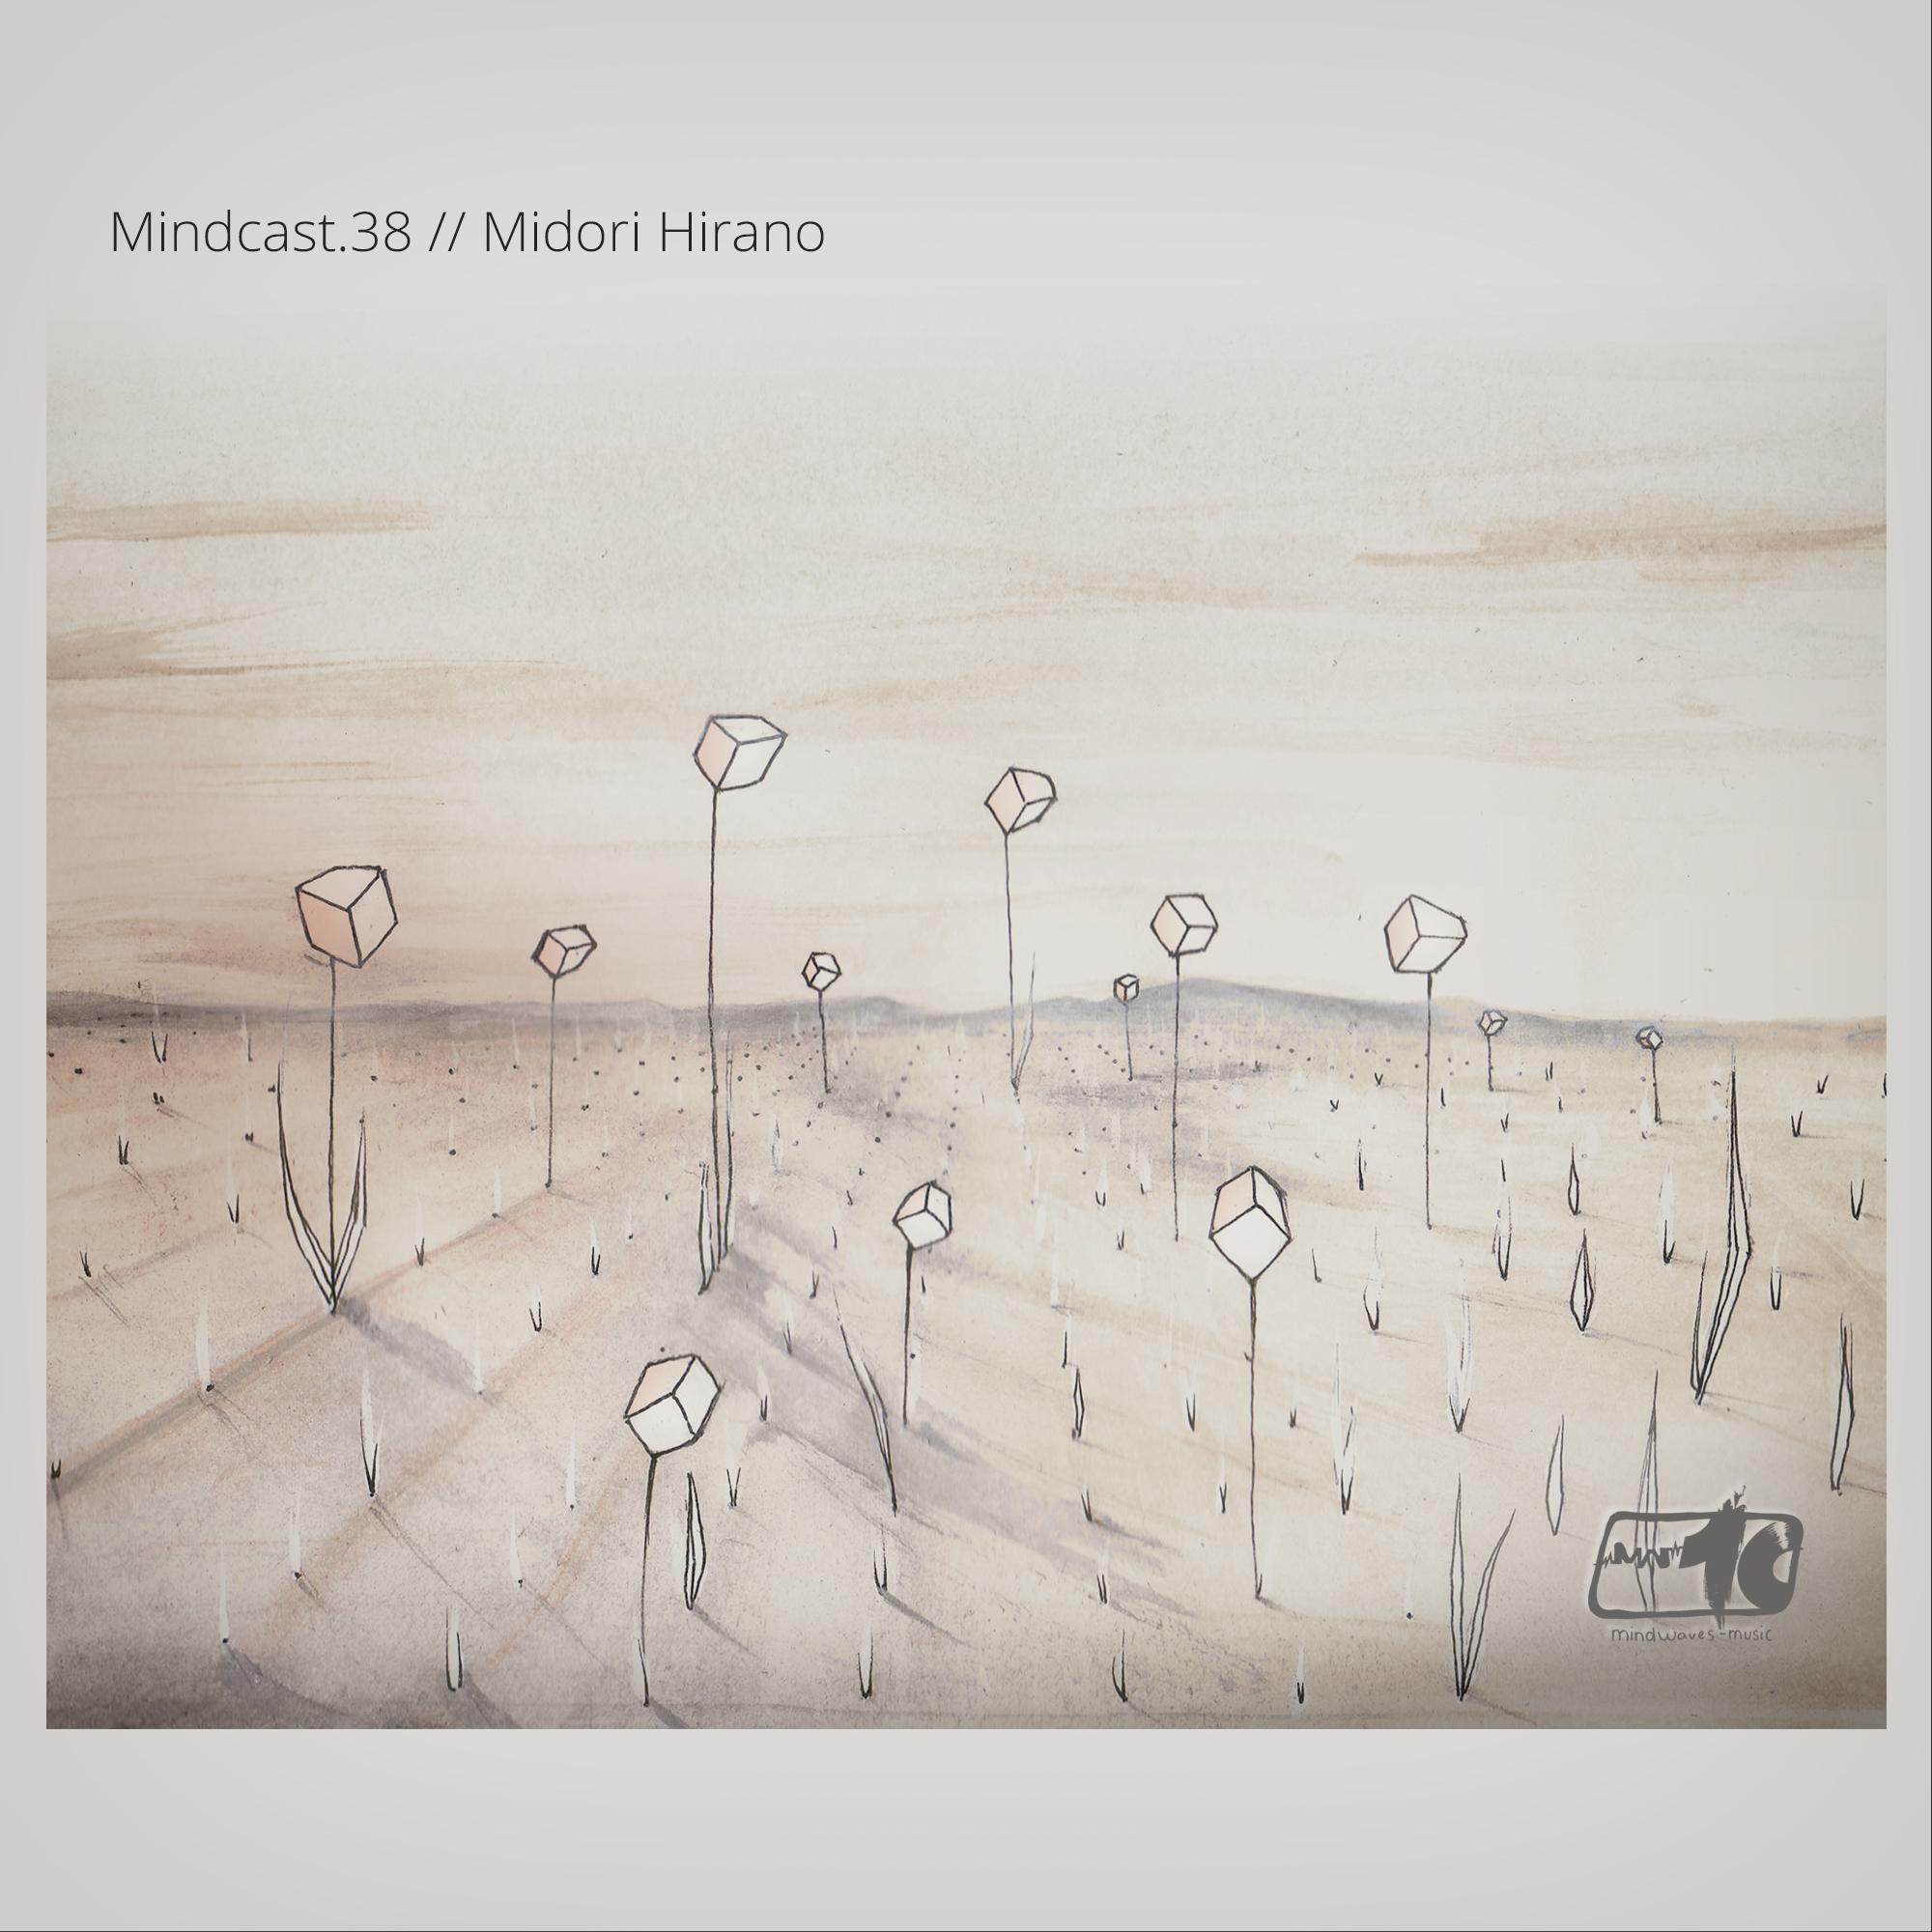 MINDCAST.38 // MIDORI HIRANO